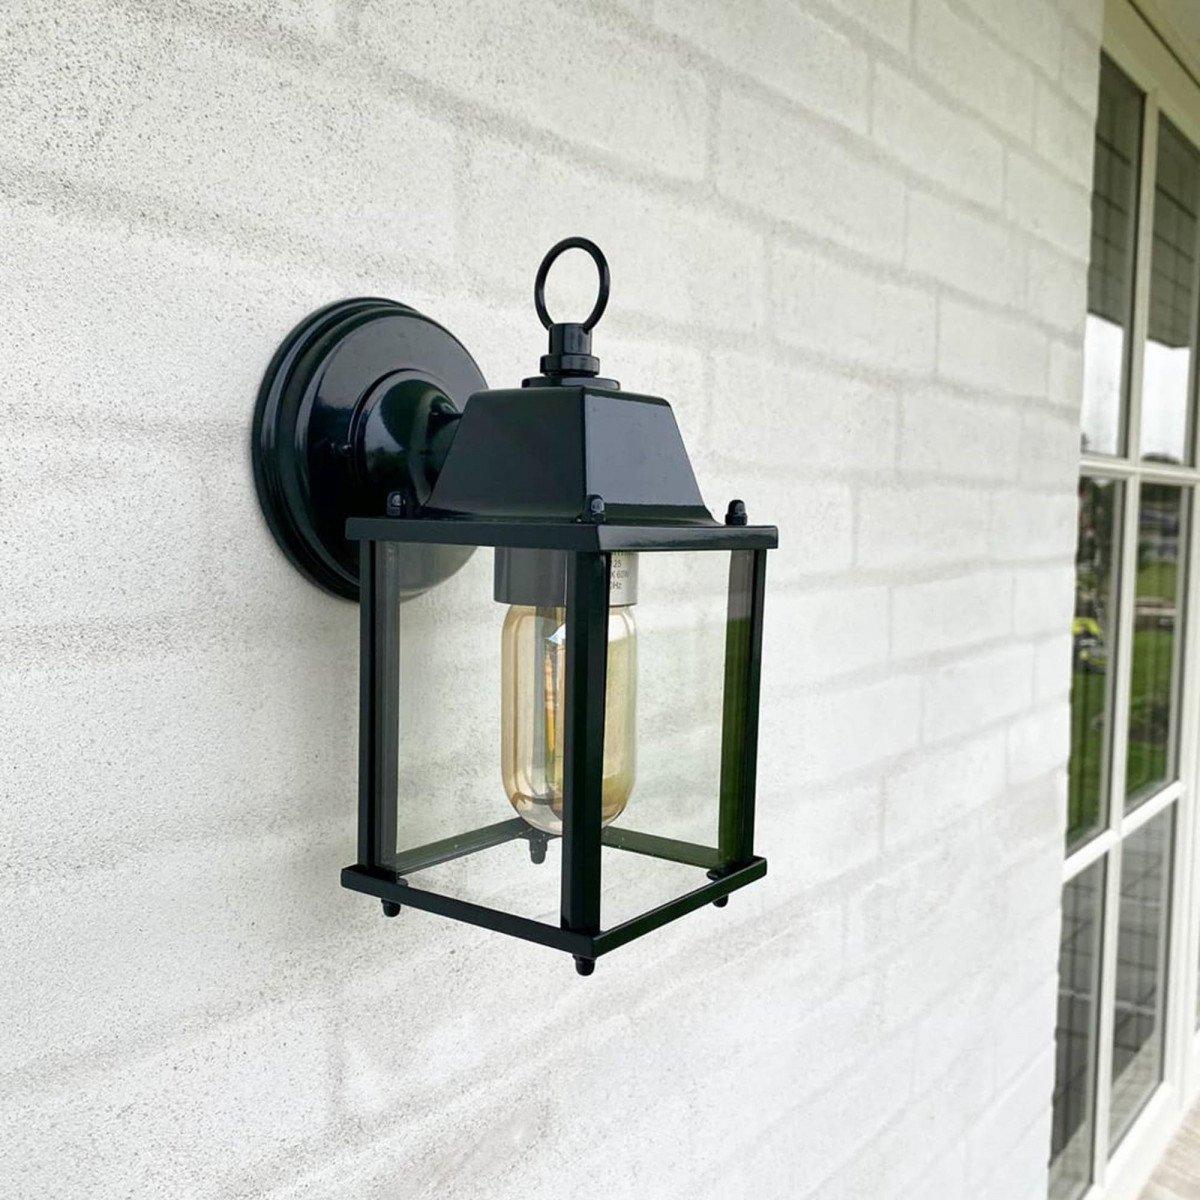 Muurlamp Koetslamp